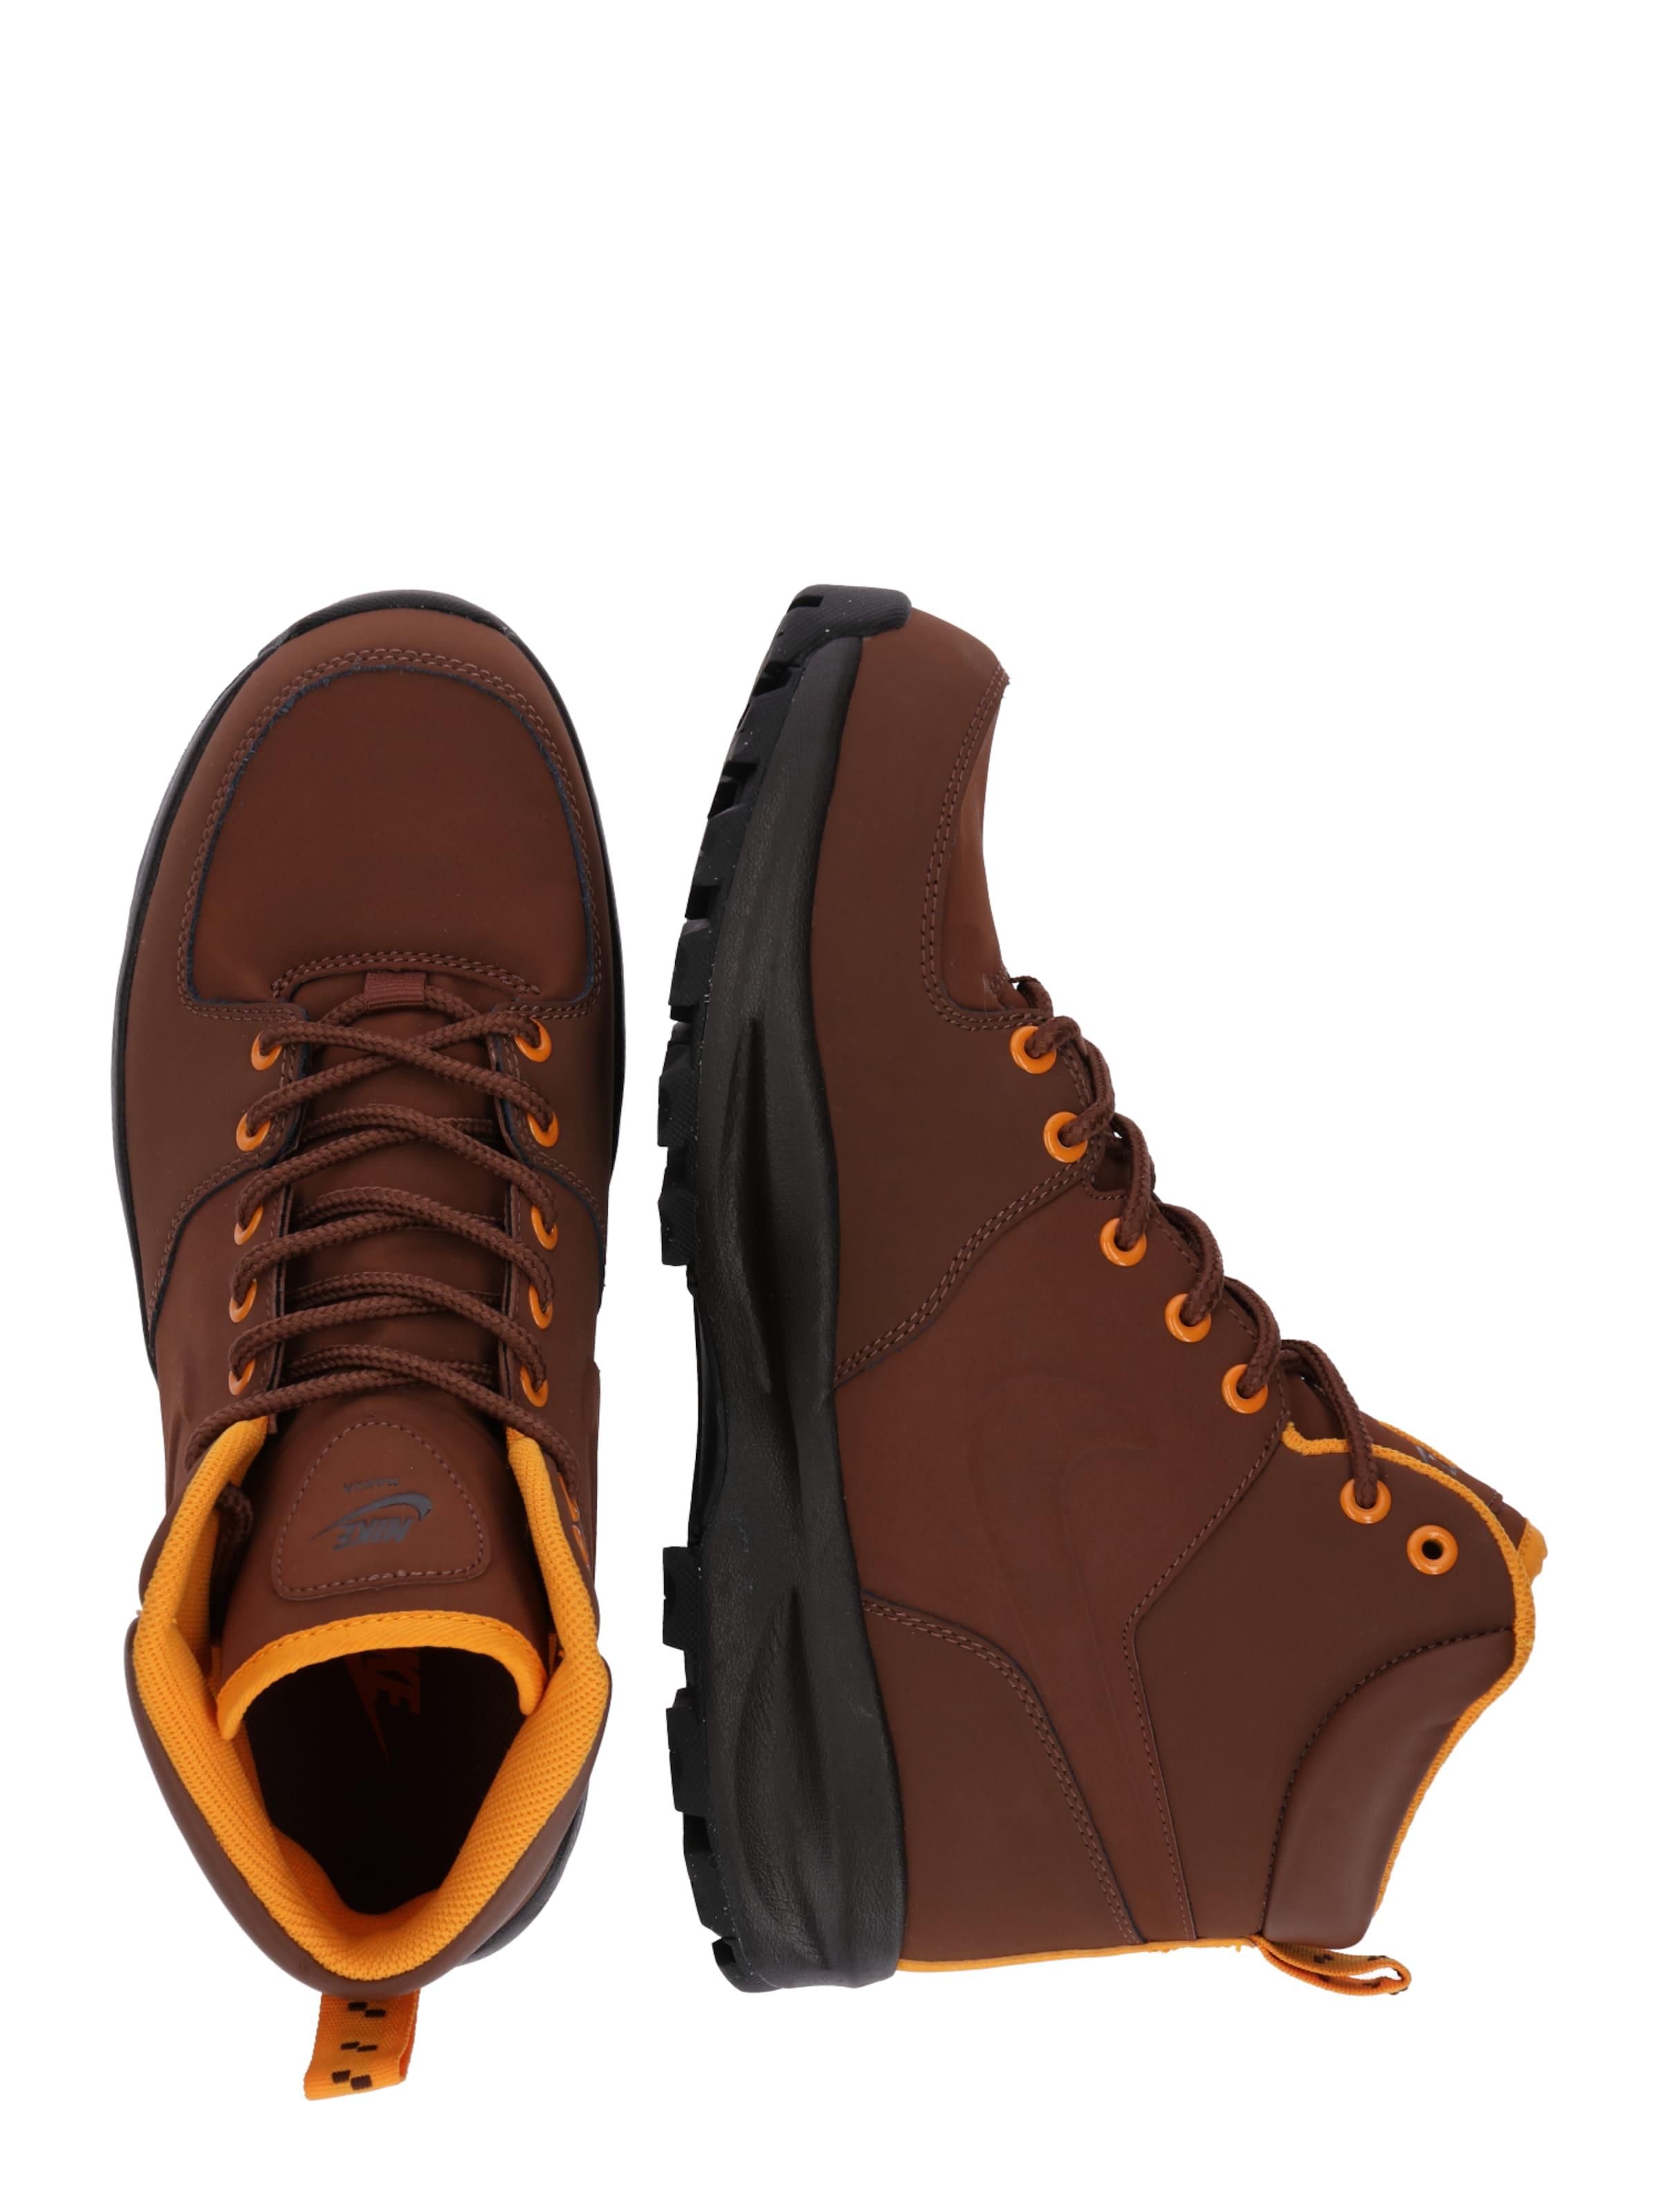 In Sneaker BraunOrange Sportswear High Nike 'manoa' CWBrodxe